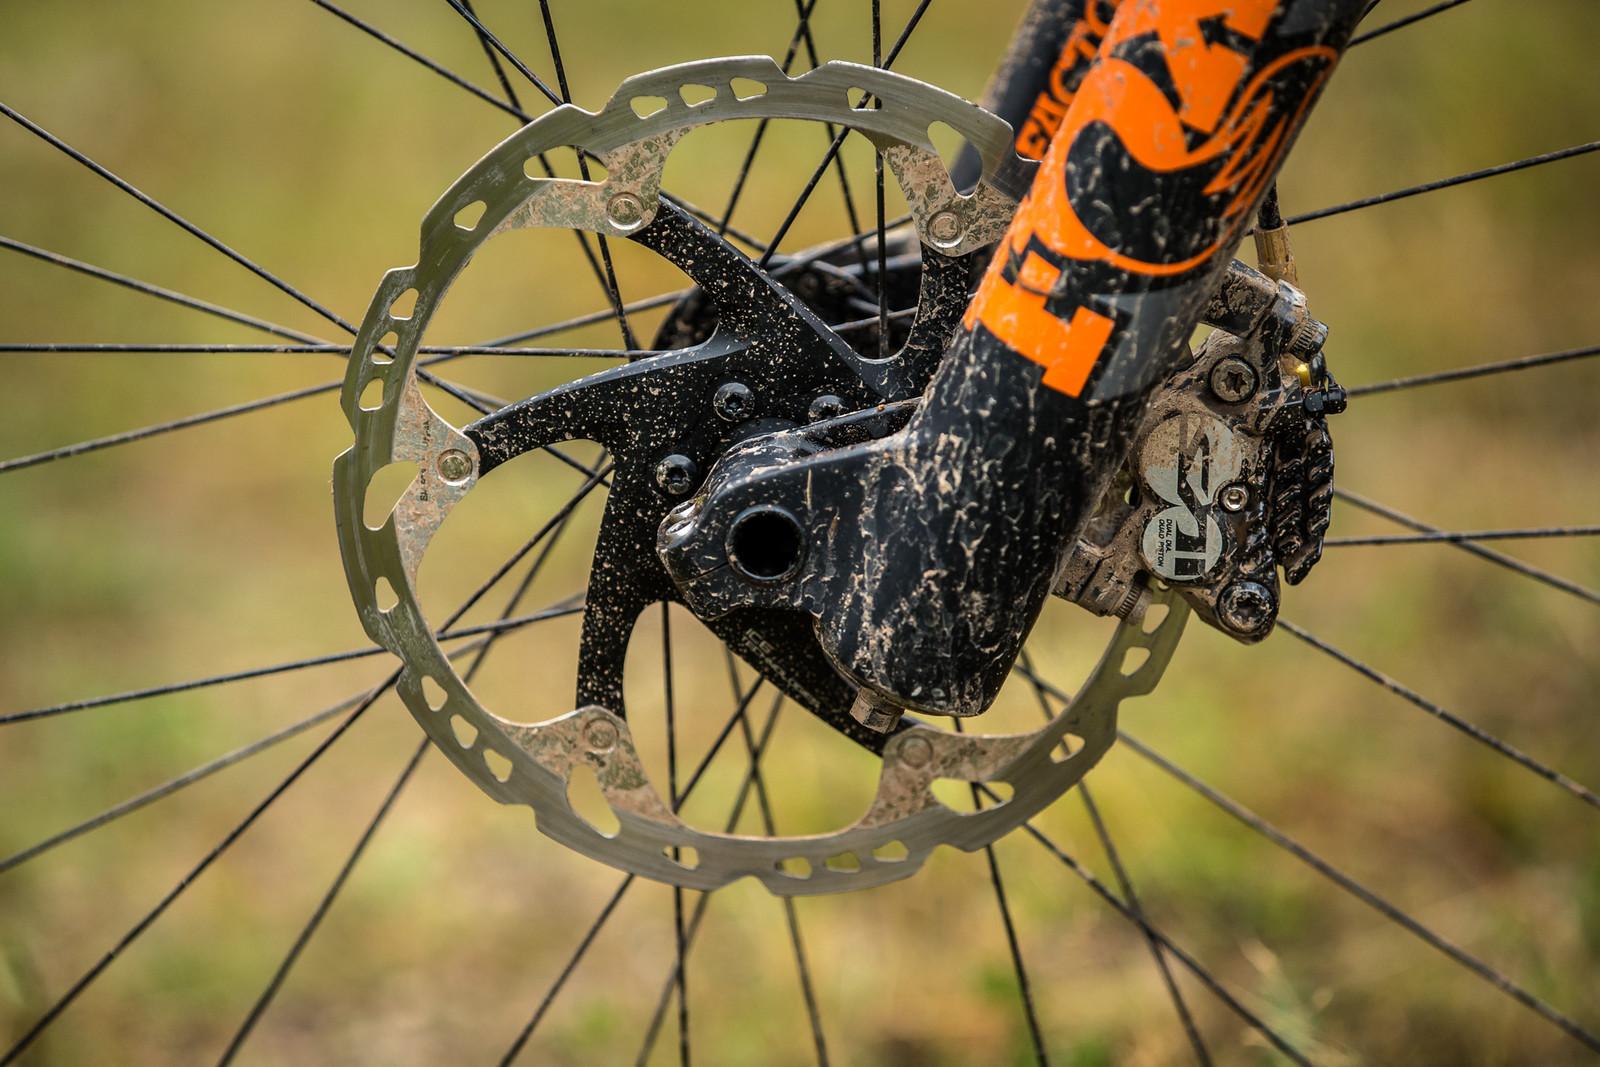 Shimano Saint Brakes, FOX 40 - WINNING BIKE - Martin Maes' GT Fury - Mountain Biking Pictures - Vital MTB